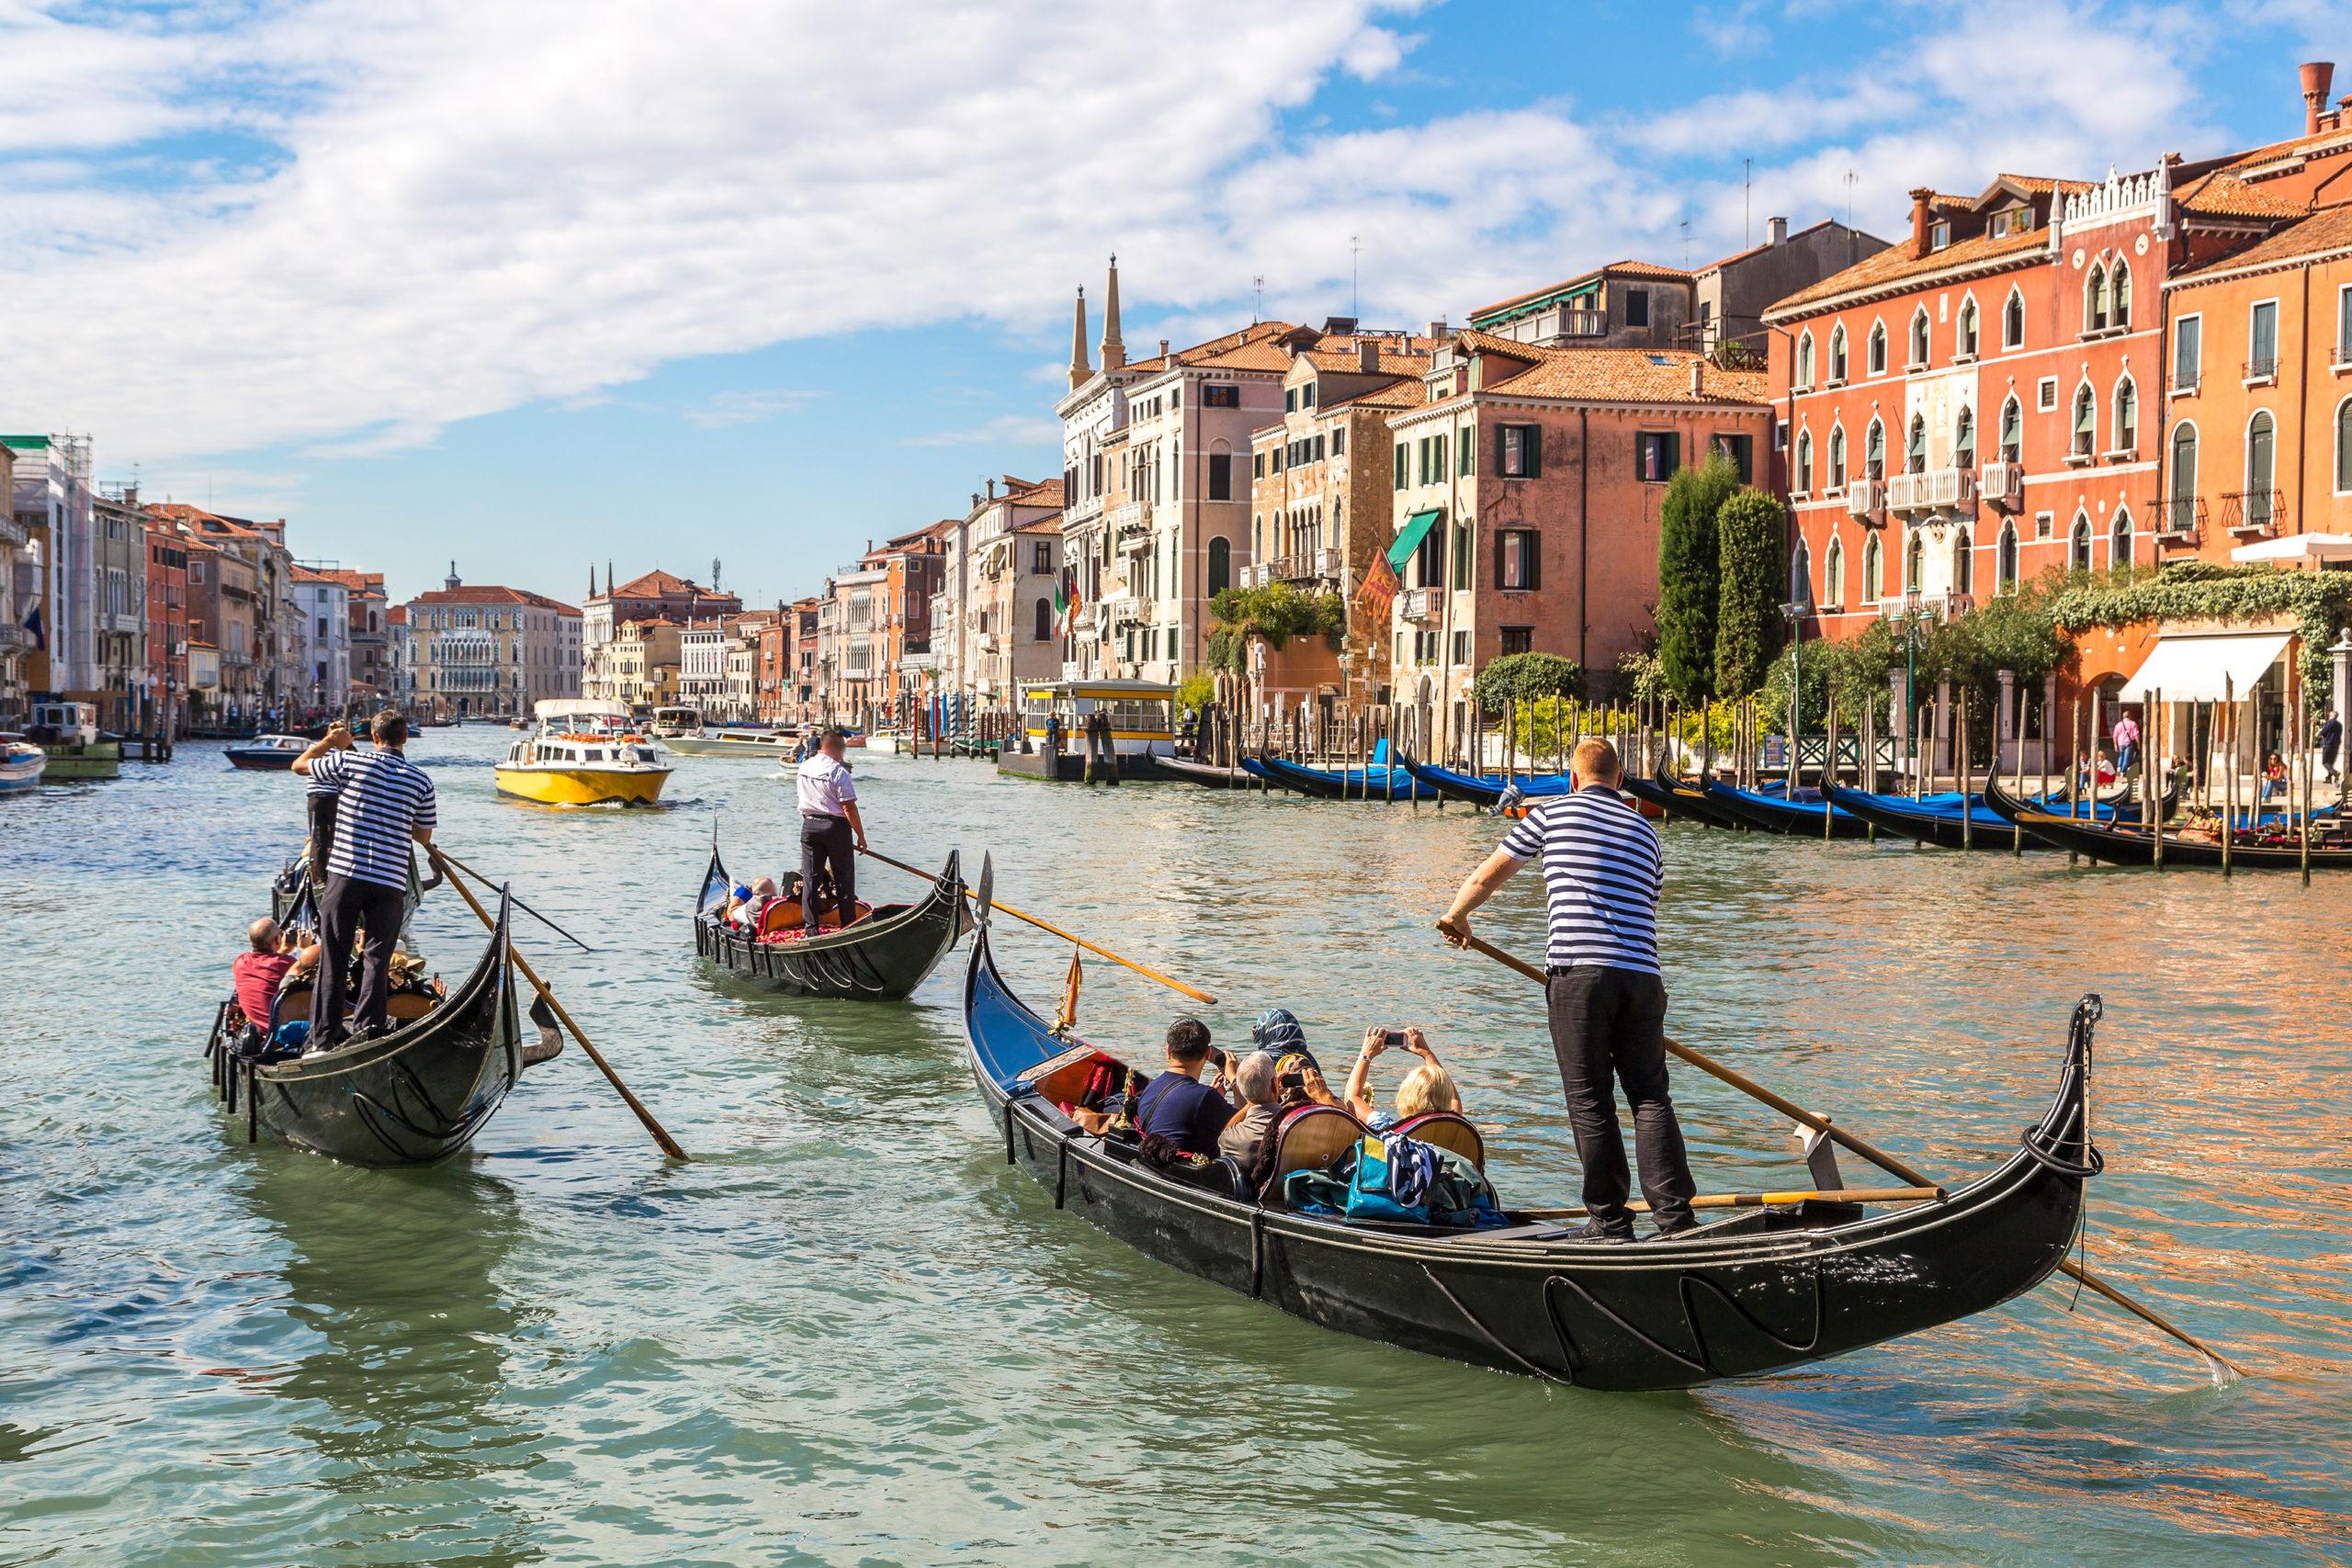 6 Must-See Famous Italian Landmarks